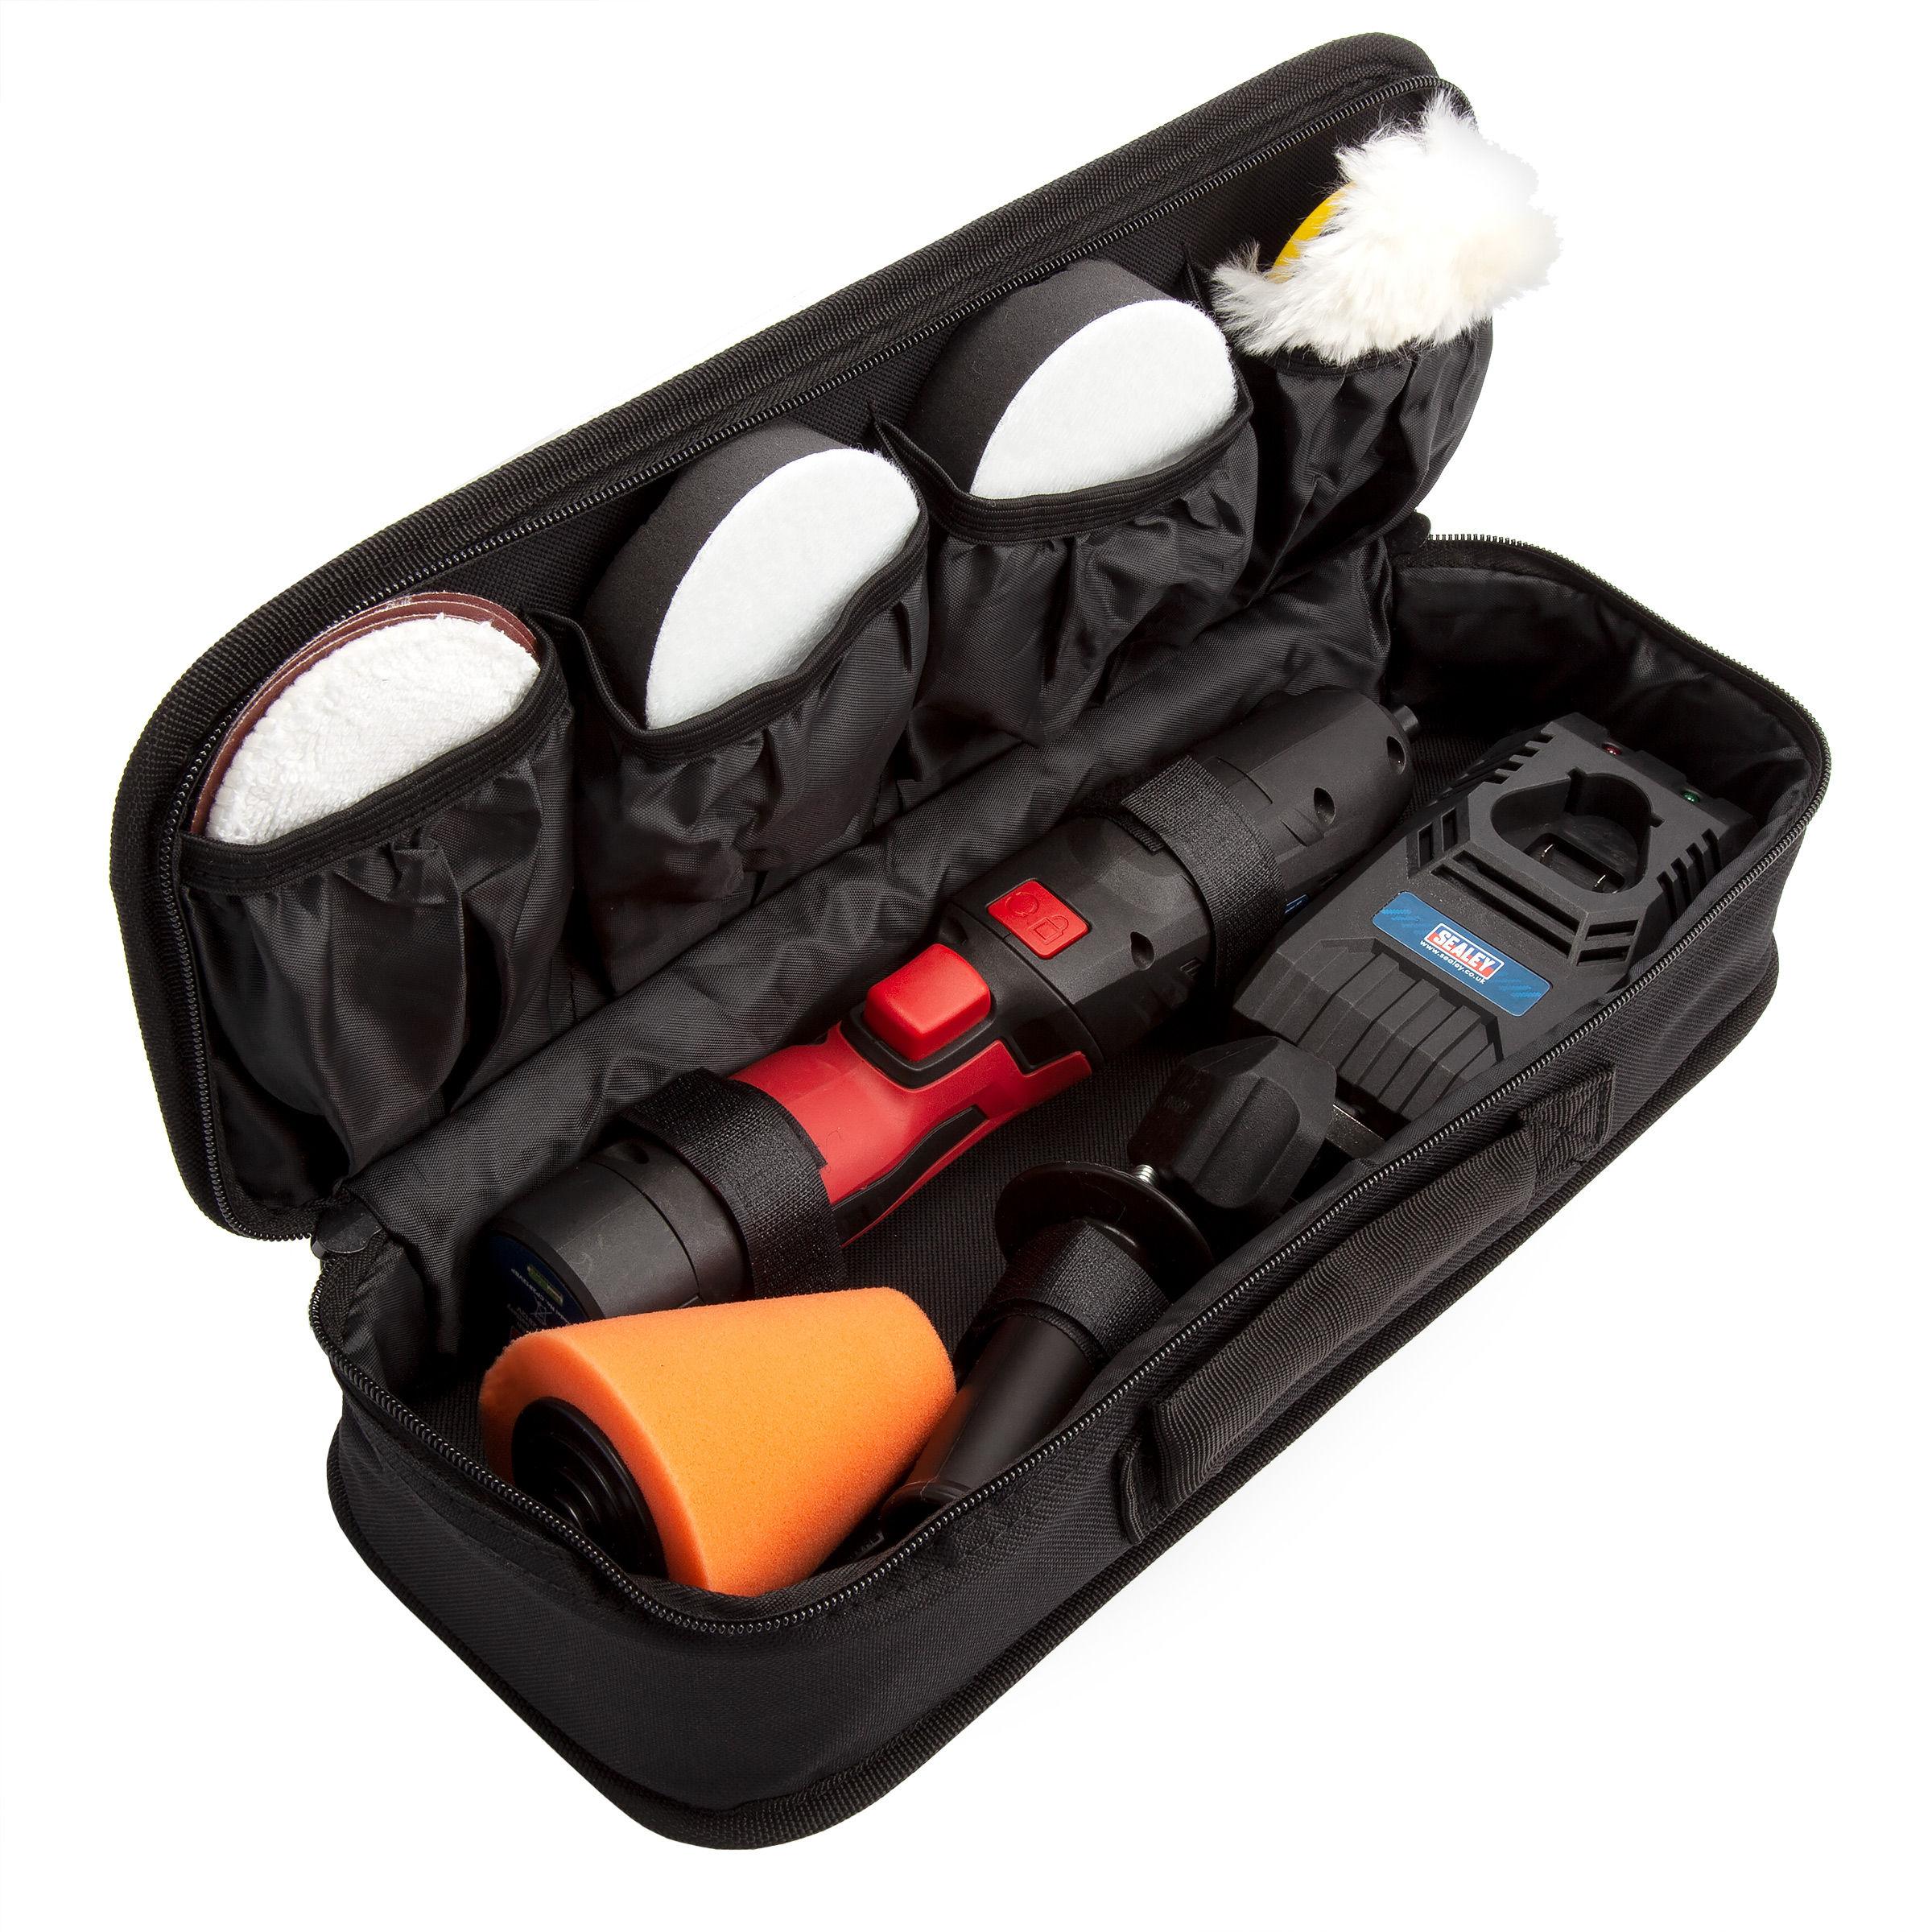 Sealey 10.8V Cordless Mini Sander//Polisher Kit Polishing Sanding